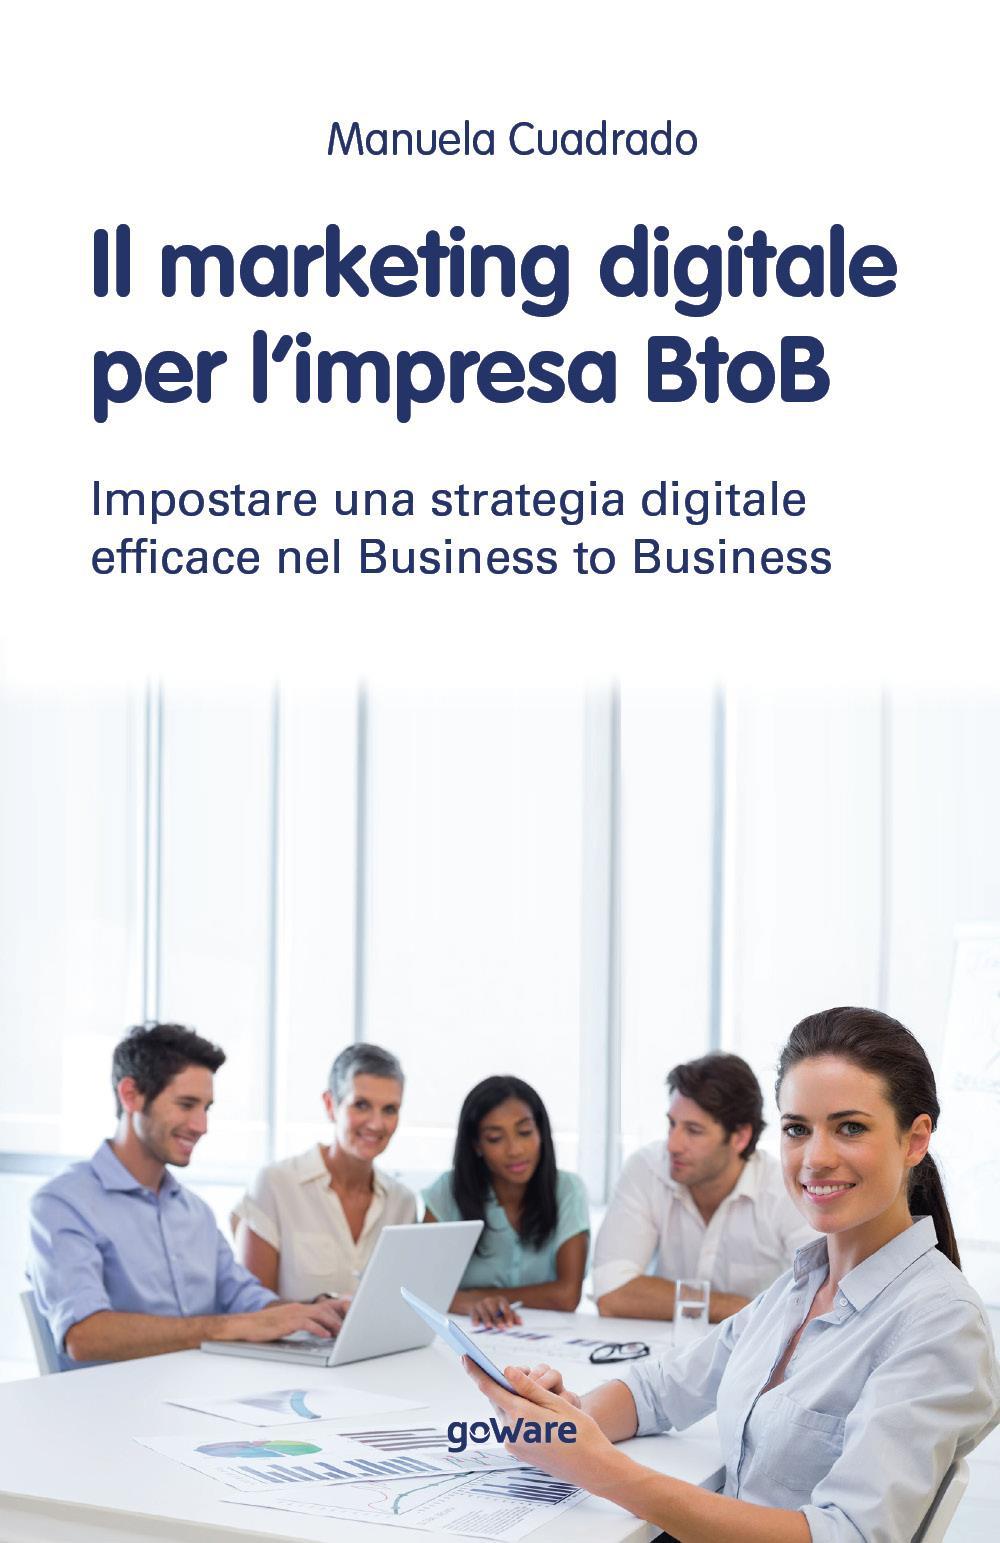 Il marketing digitale per l'impresa BtoB. Impostare una strategia digitale efficace nel business to business